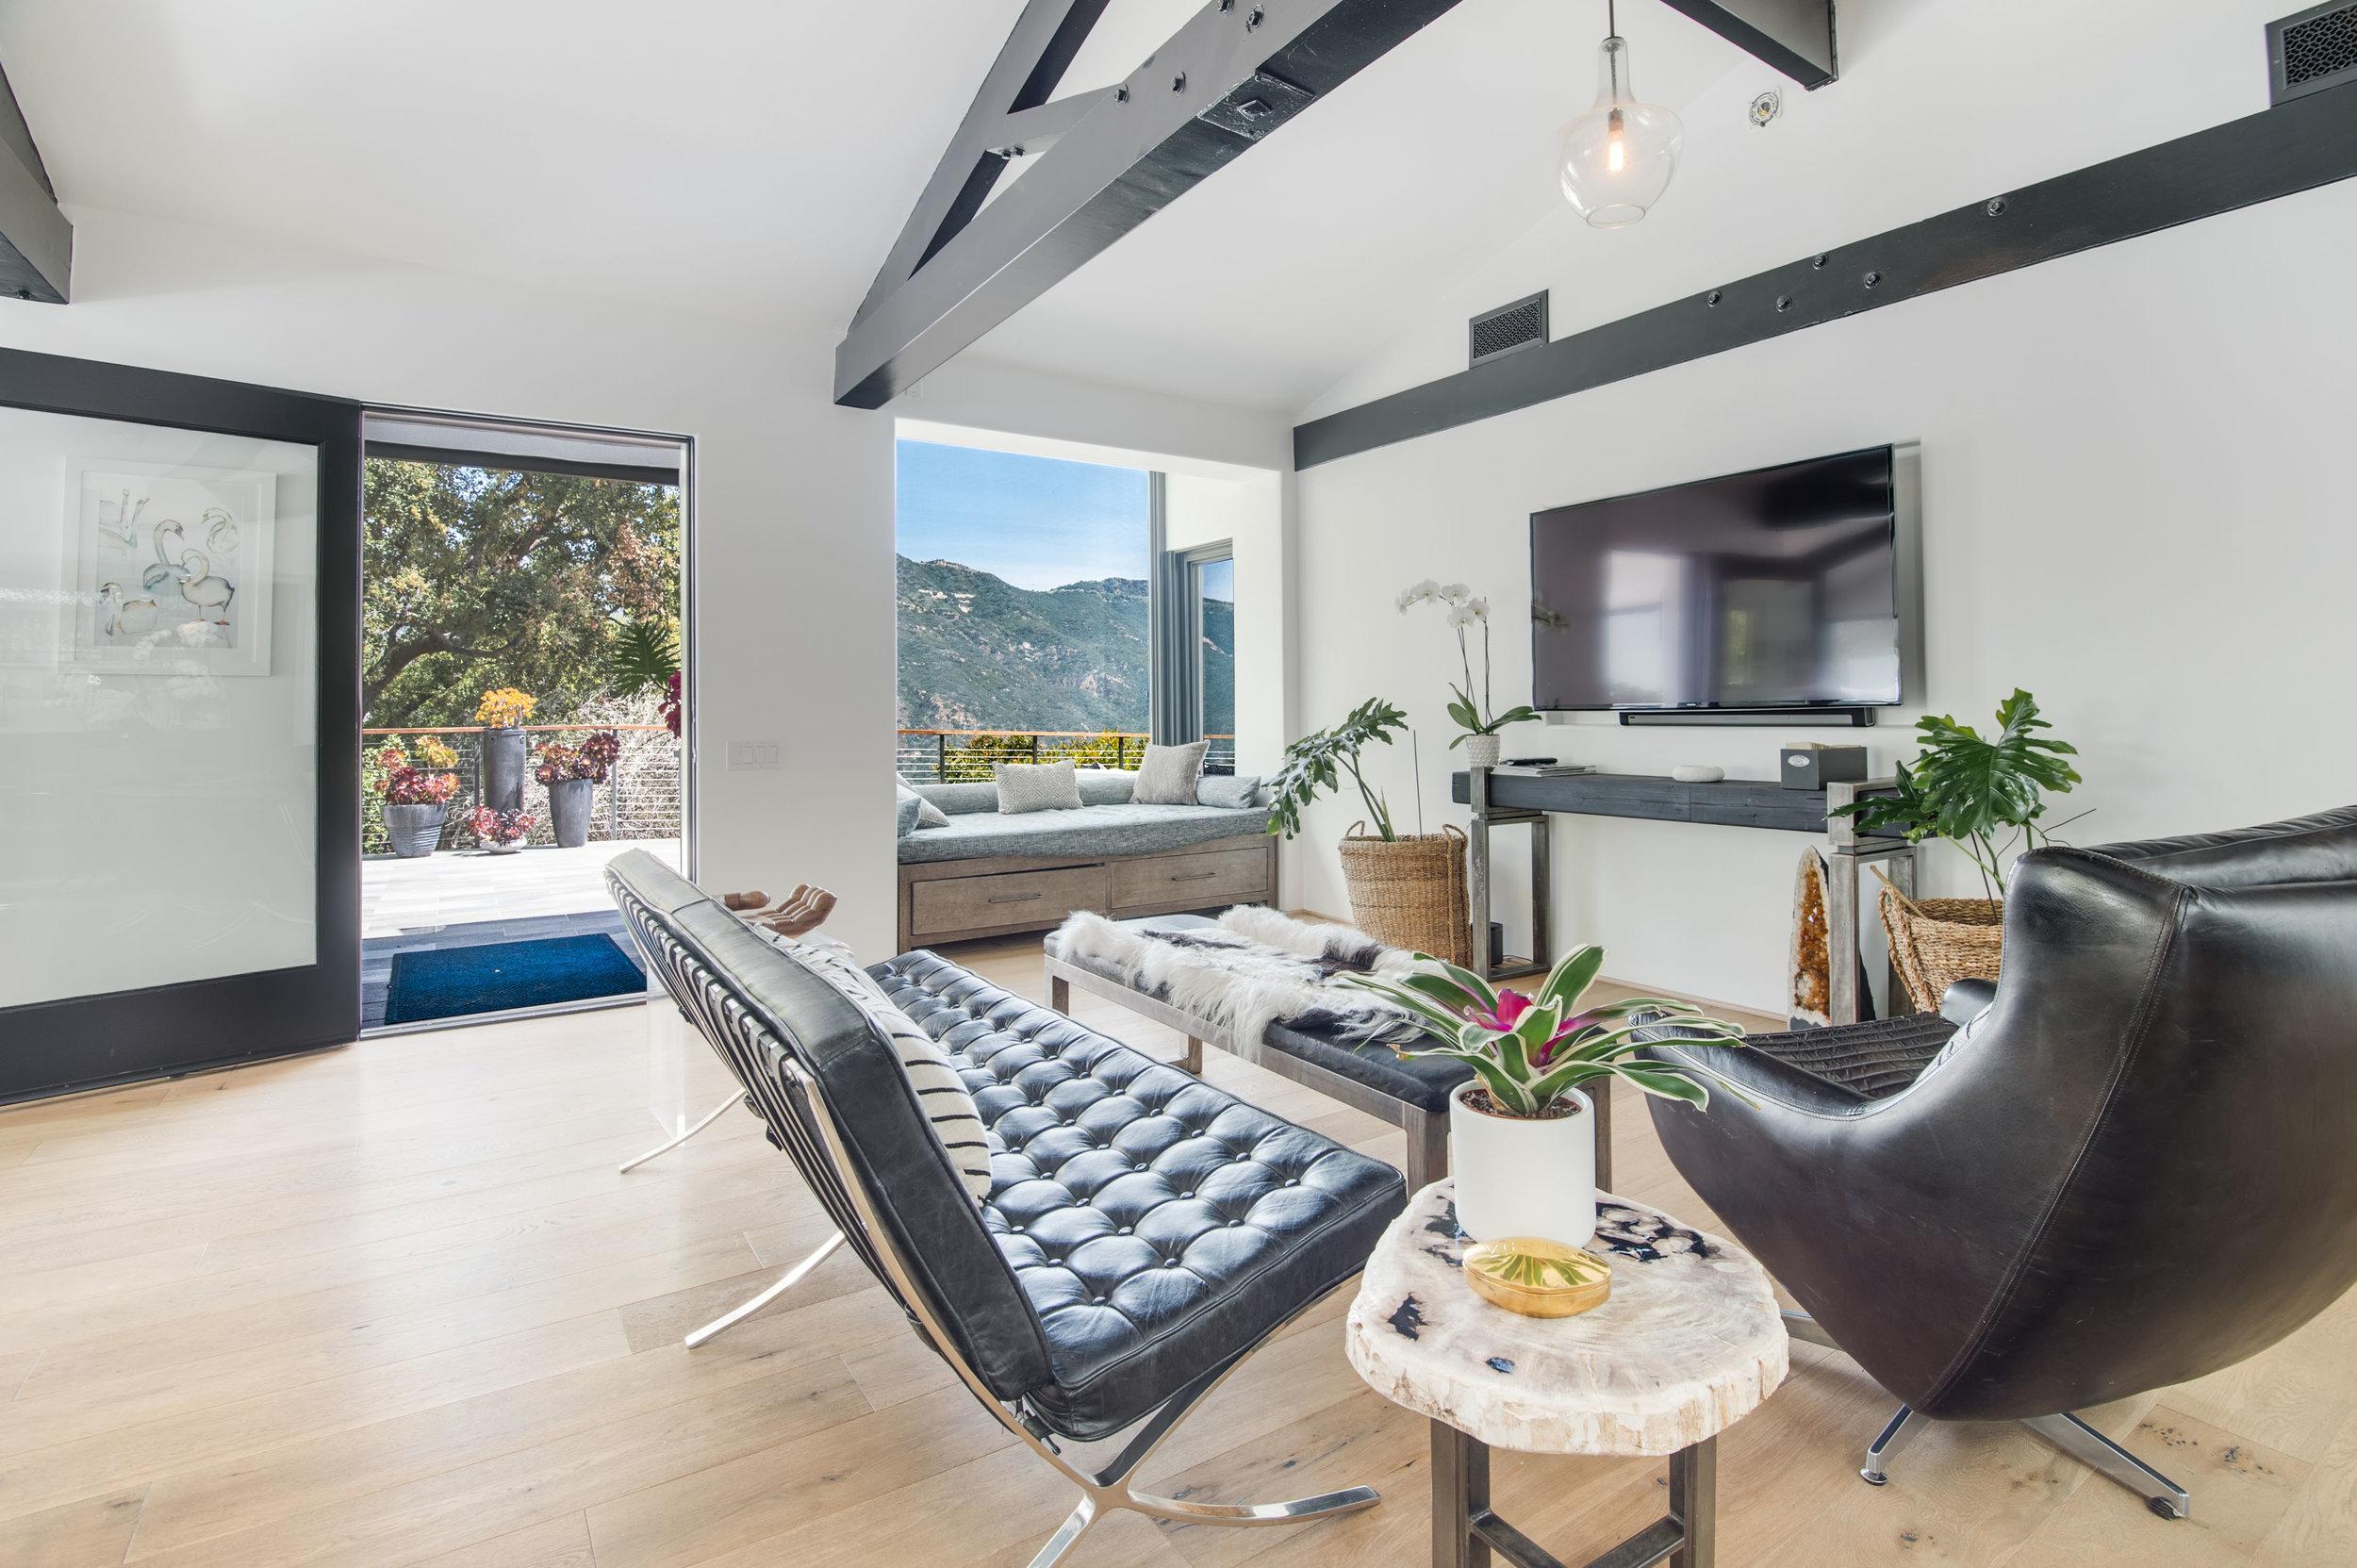 009 Living Room 26272 Cool Glen Way Malibu For Sale Luxury Real Estate.jpg